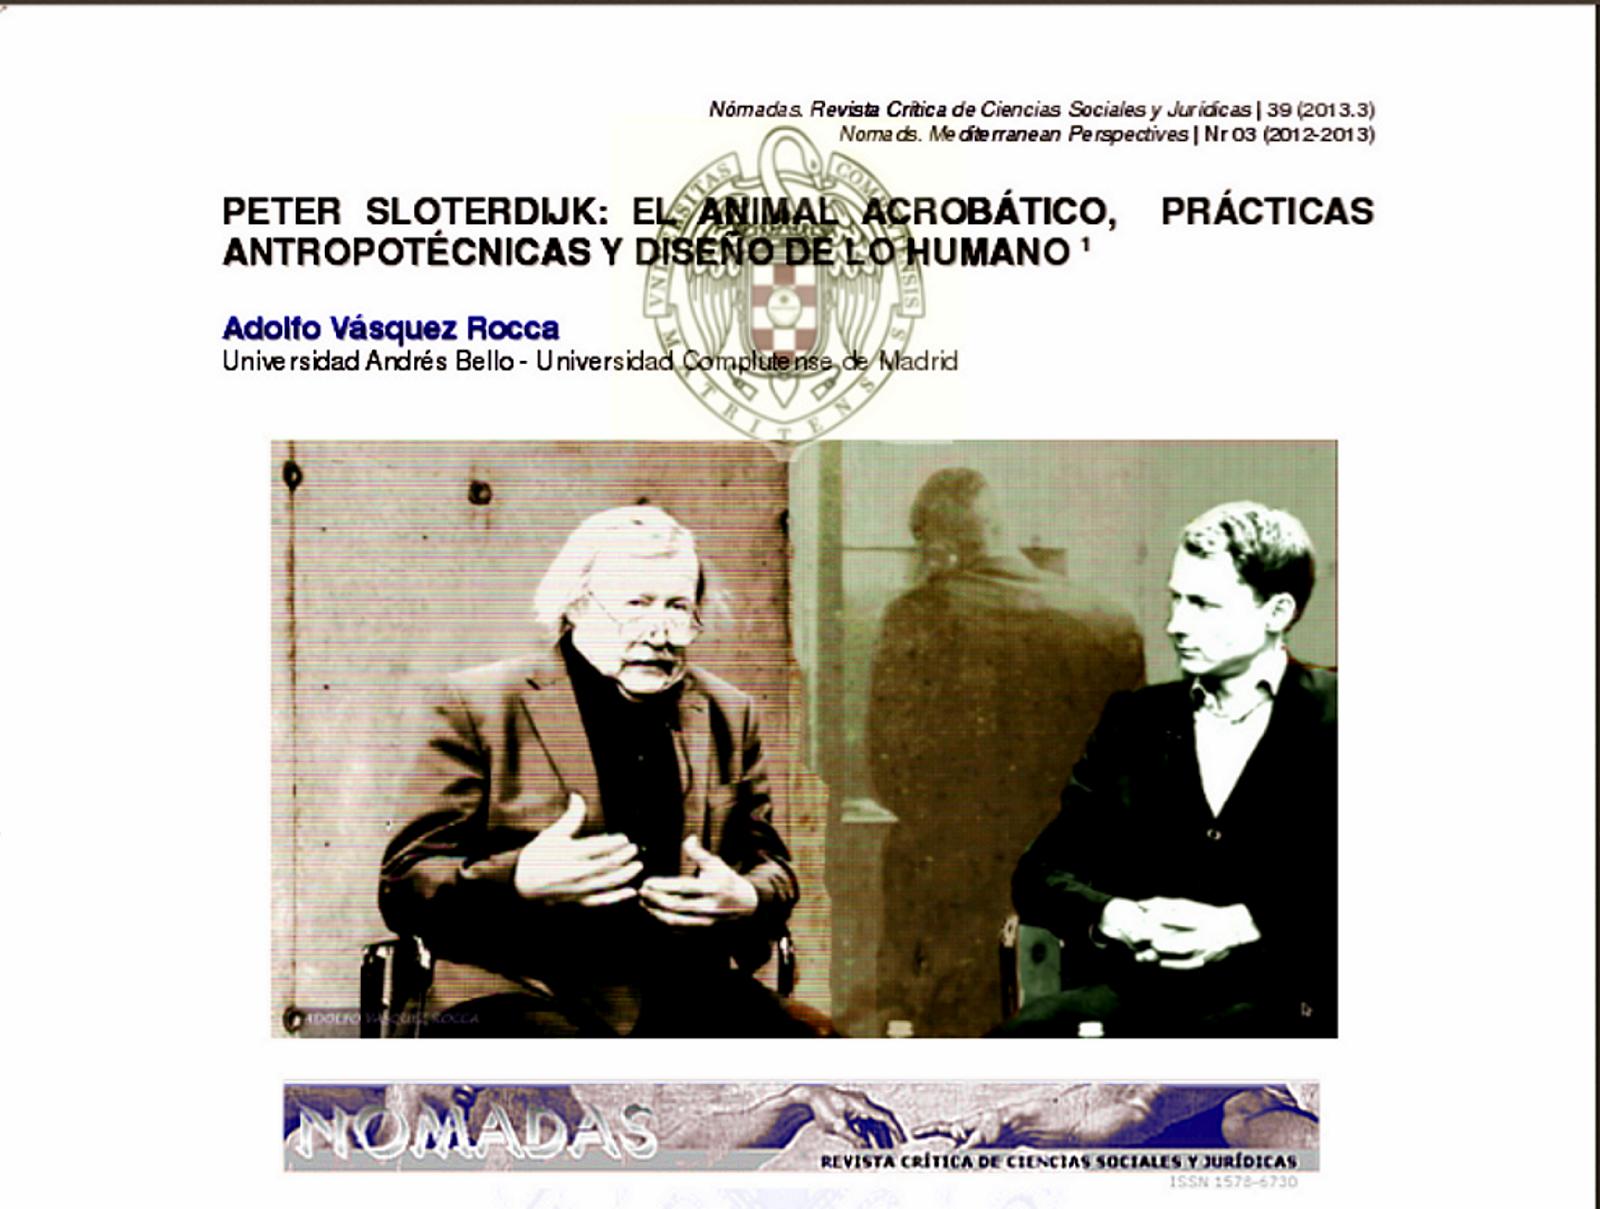 http://1.bp.blogspot.com/-iwbKaXUwr-M/UkOKIMv28qI/AAAAAAAAKiI/Wt7ipcODCCM/s1600/Sloterdijk+_+El+Animal+Acrobatico_+Nomadas+N+39_+2013.++UCM+_+Dr.+Adolfo+V%25C3%25A1squez+Rocca+_+XXL.png